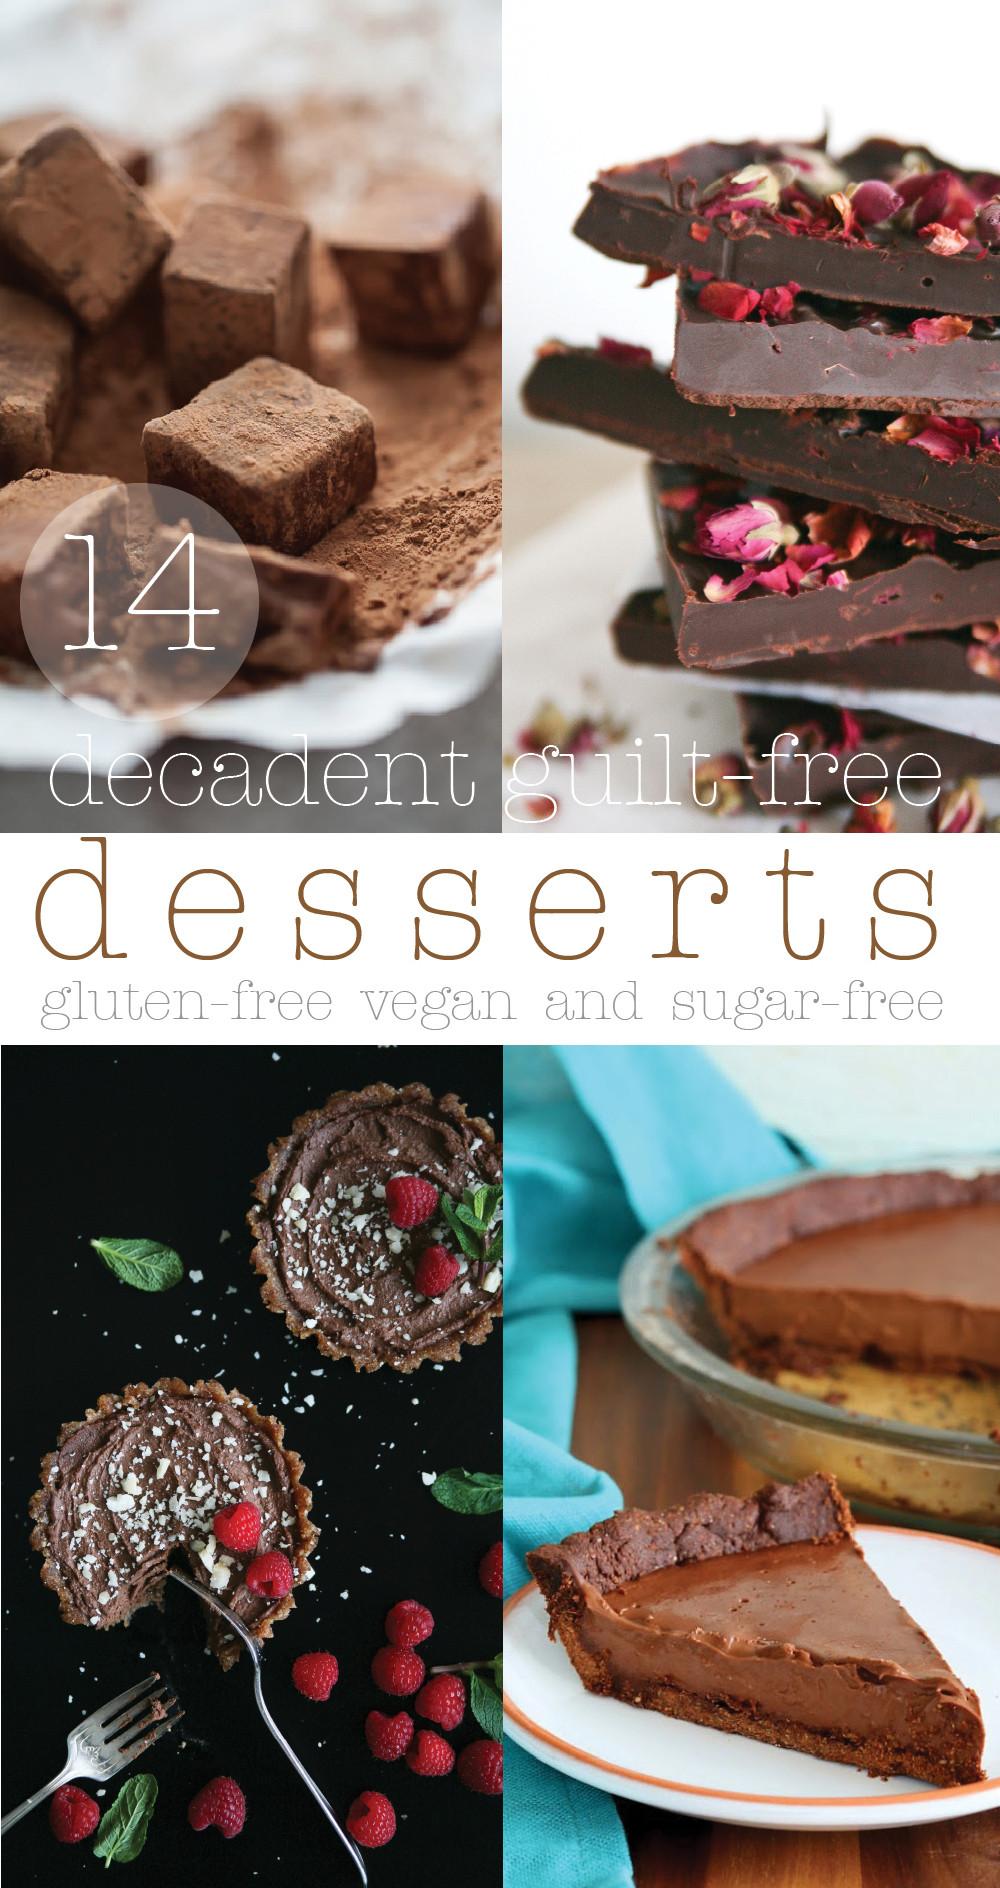 Sugar And Dairy Free Desserts  14 Decadent Guilt free sugar free Desserts Pure Ella